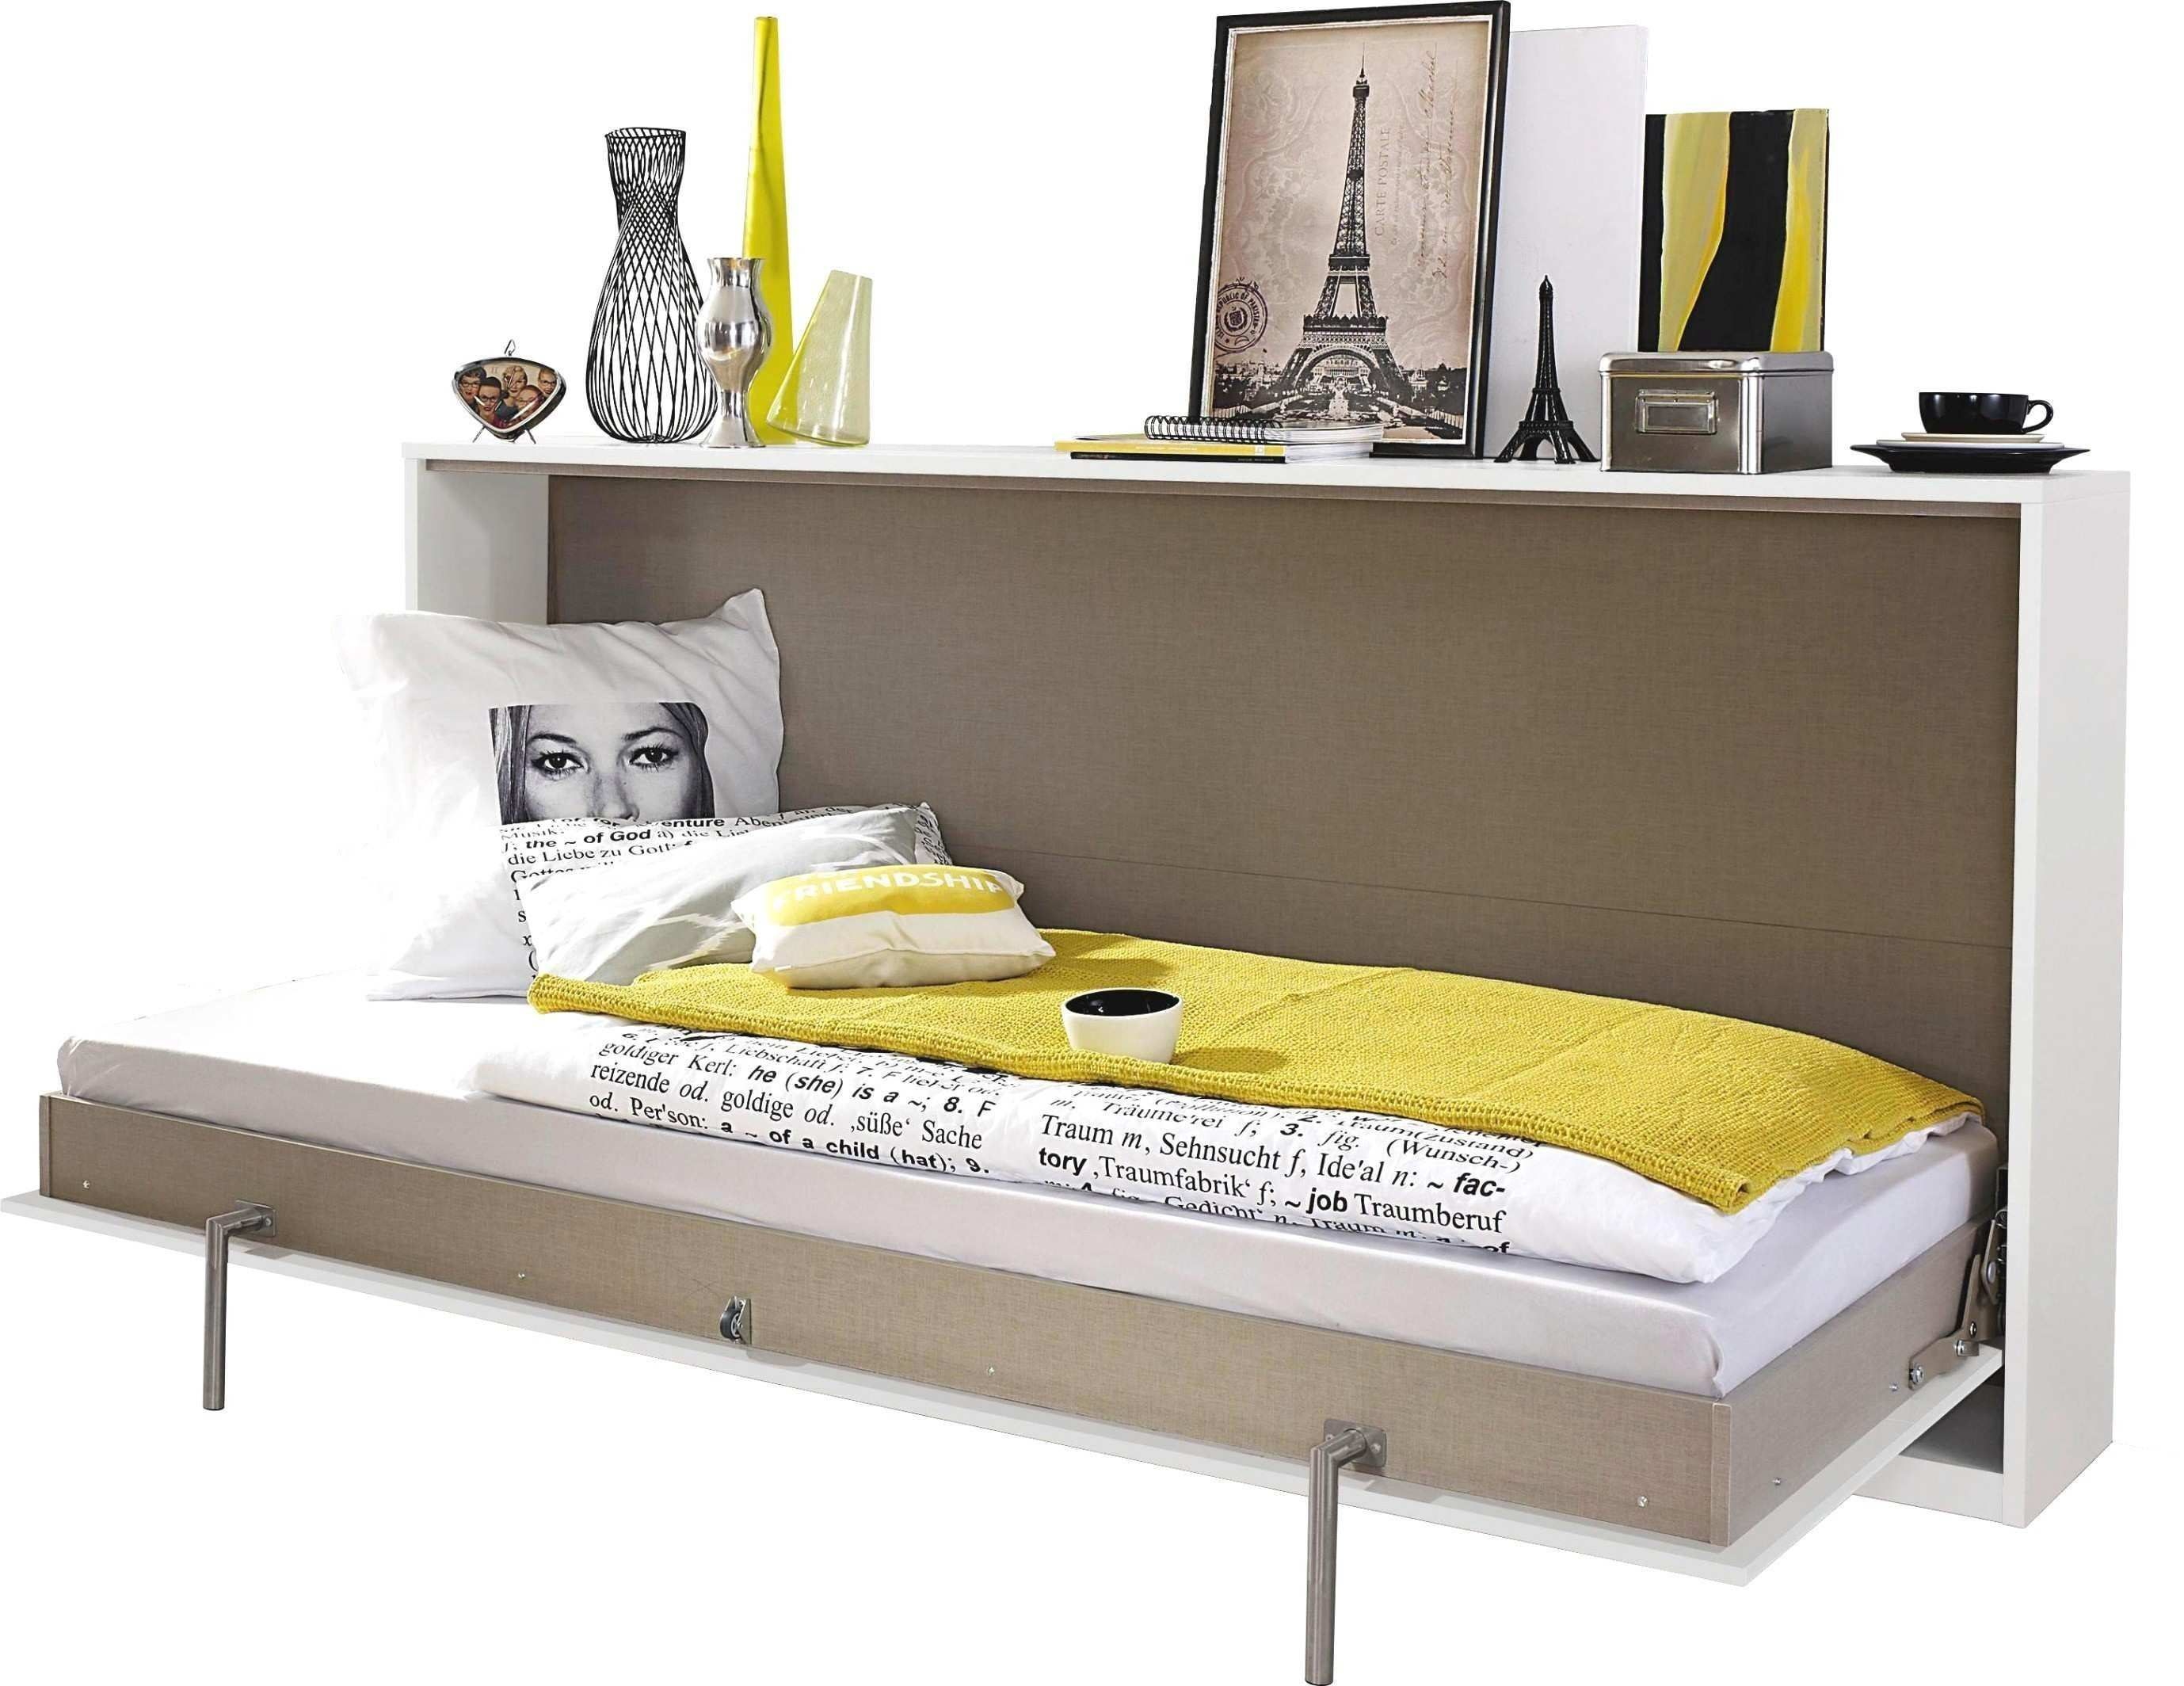 Ikea Lit D Enfant Charmant Lit Reversible Ikea Ikea Lit Kura Meilleur De Kleine Zimmer